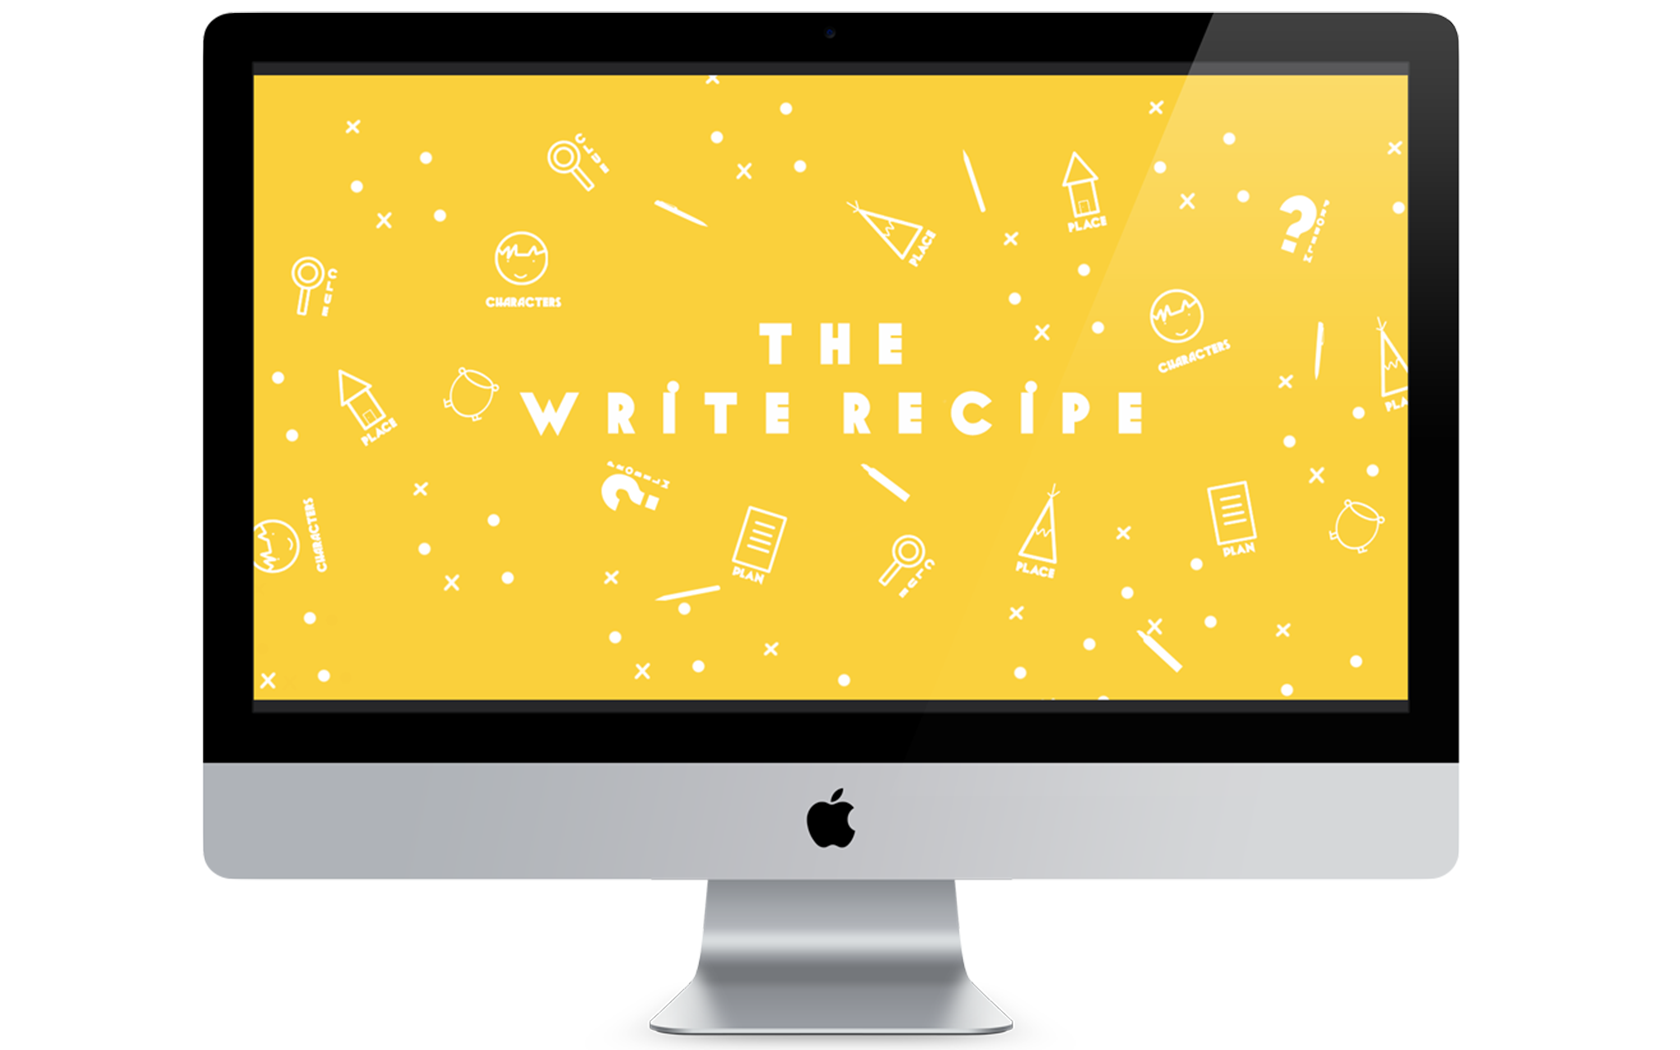 The Write Recipe